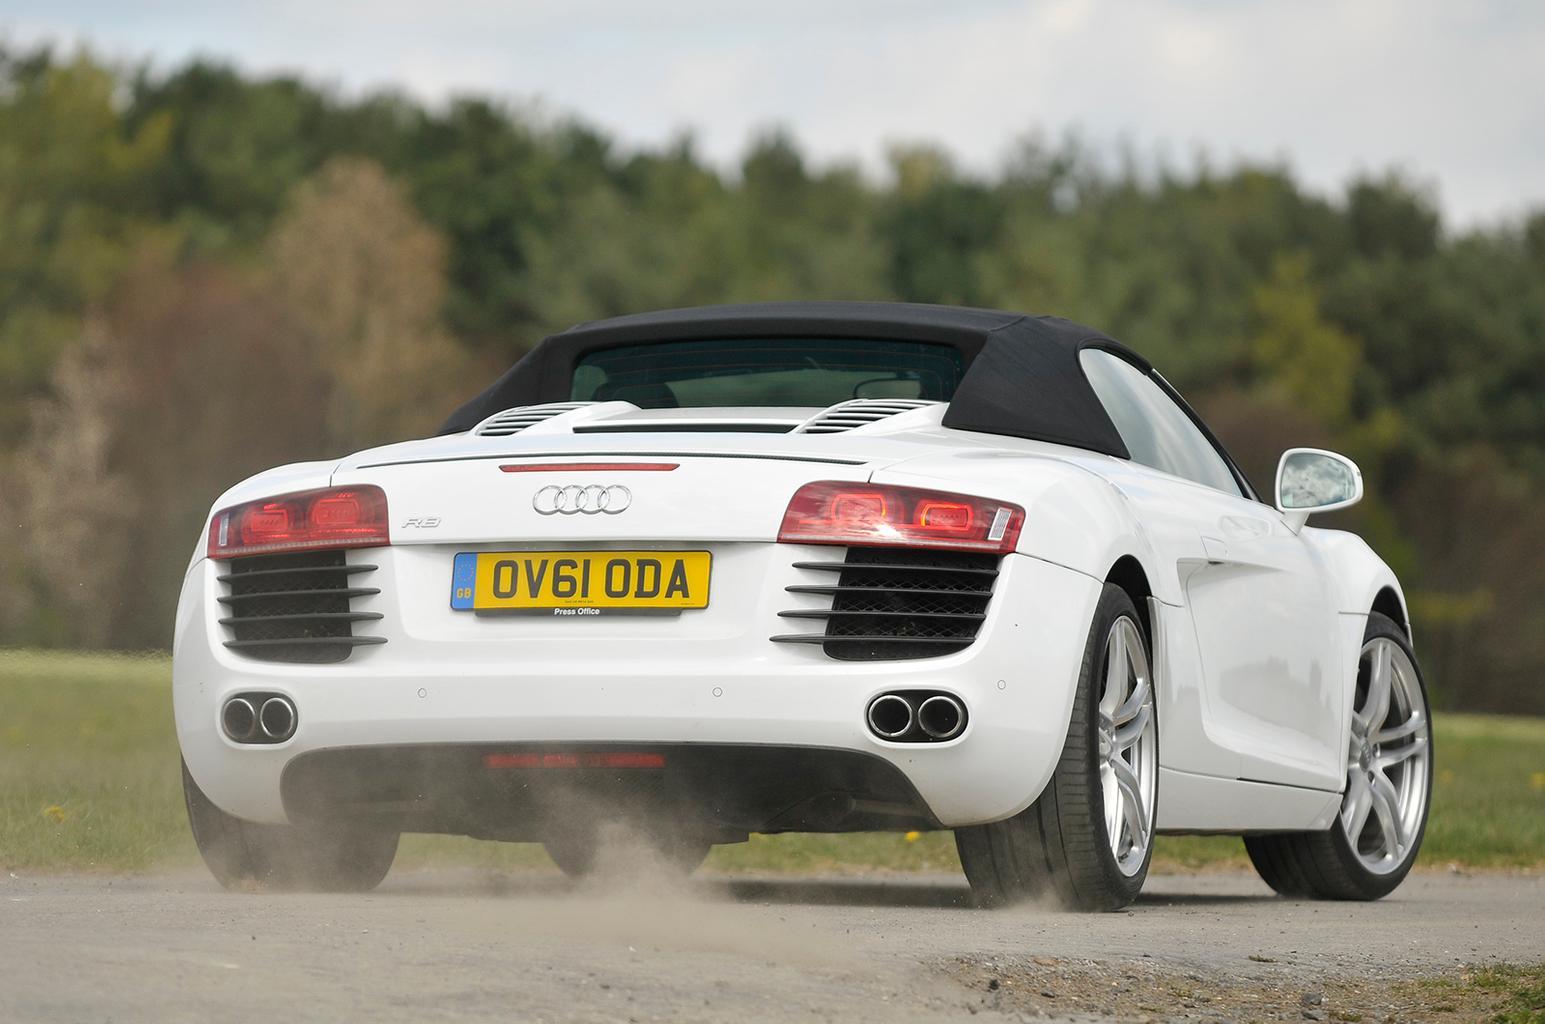 Used Audi R8 Spyder vs Porsche 911 Cabriolet